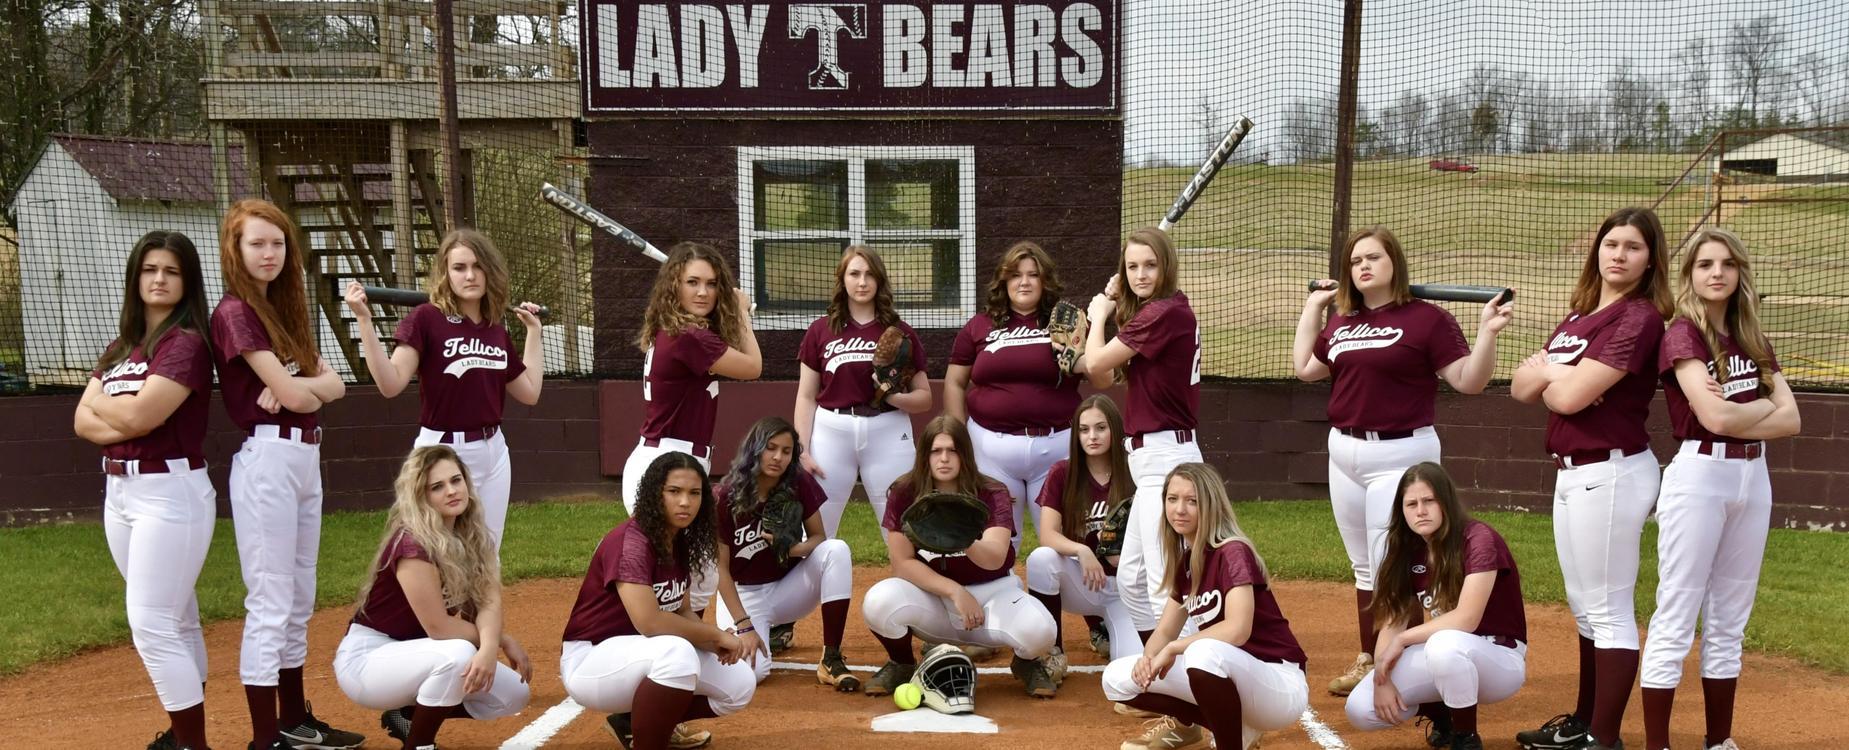 2021 Lady Bears Softball